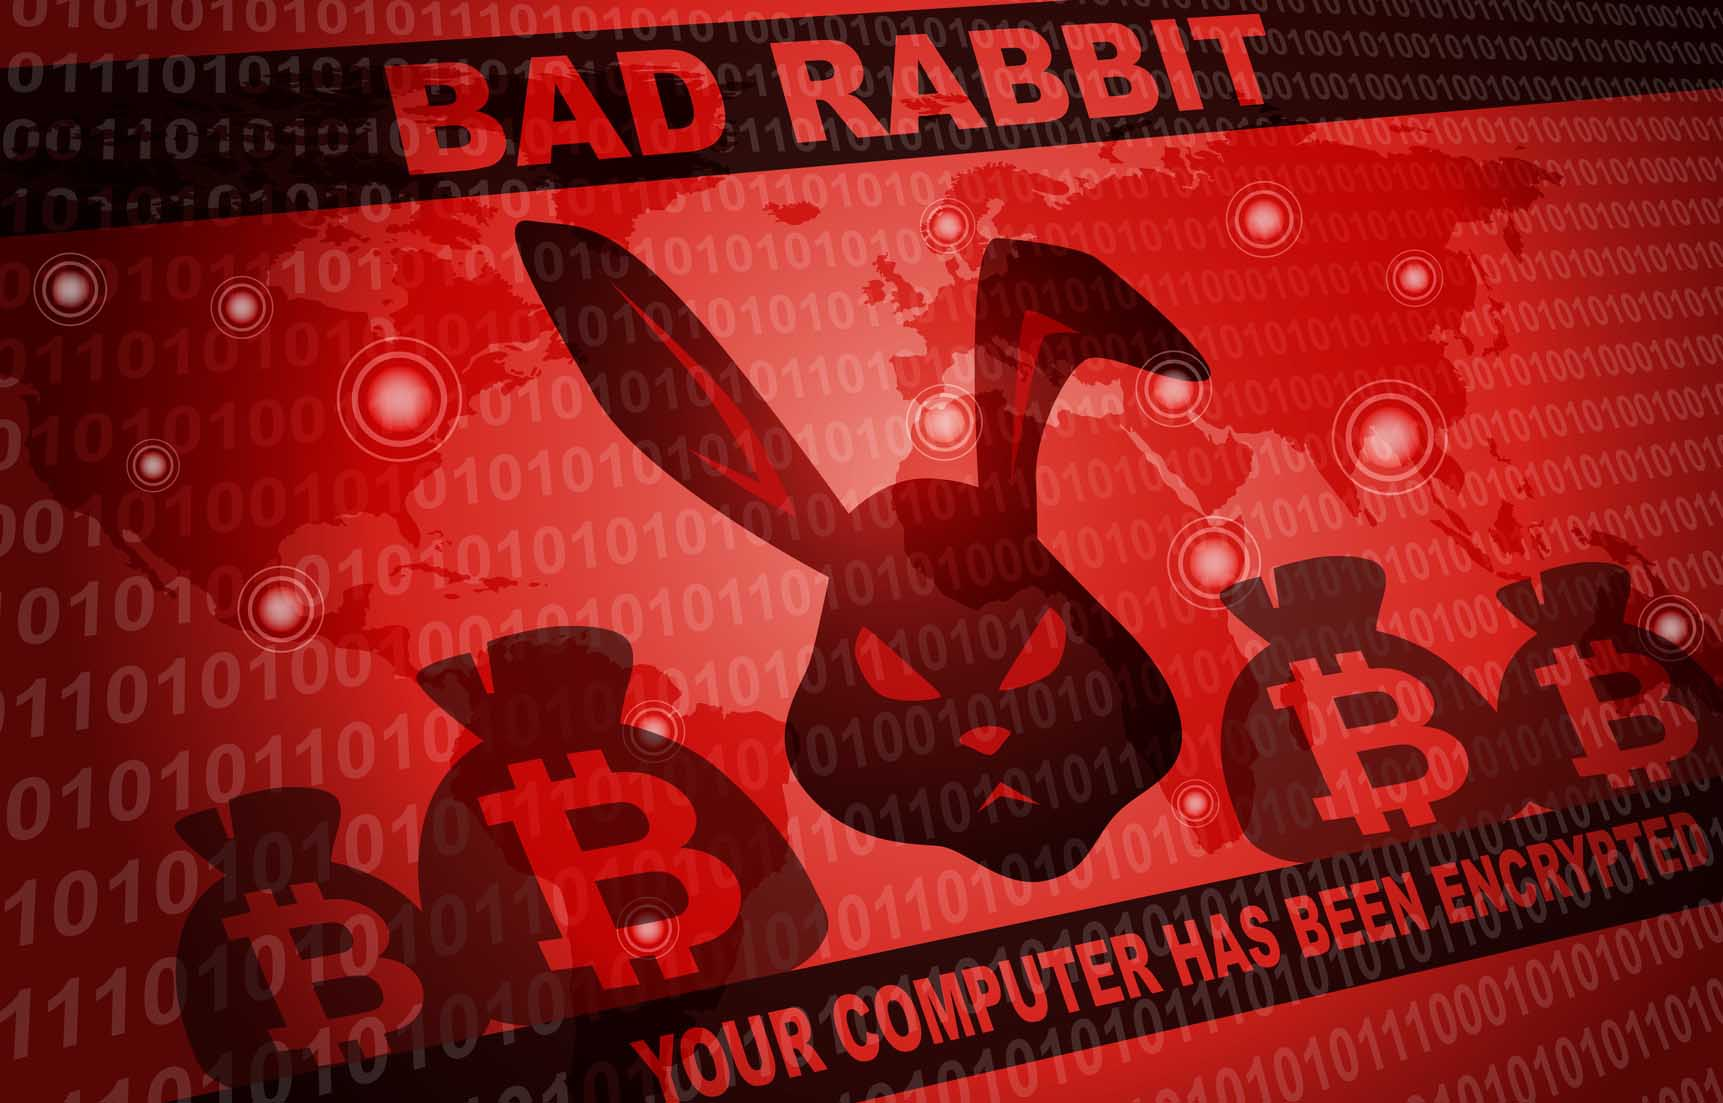 Bad Rabbit Ransomware Attack Malware Hacker Around The World